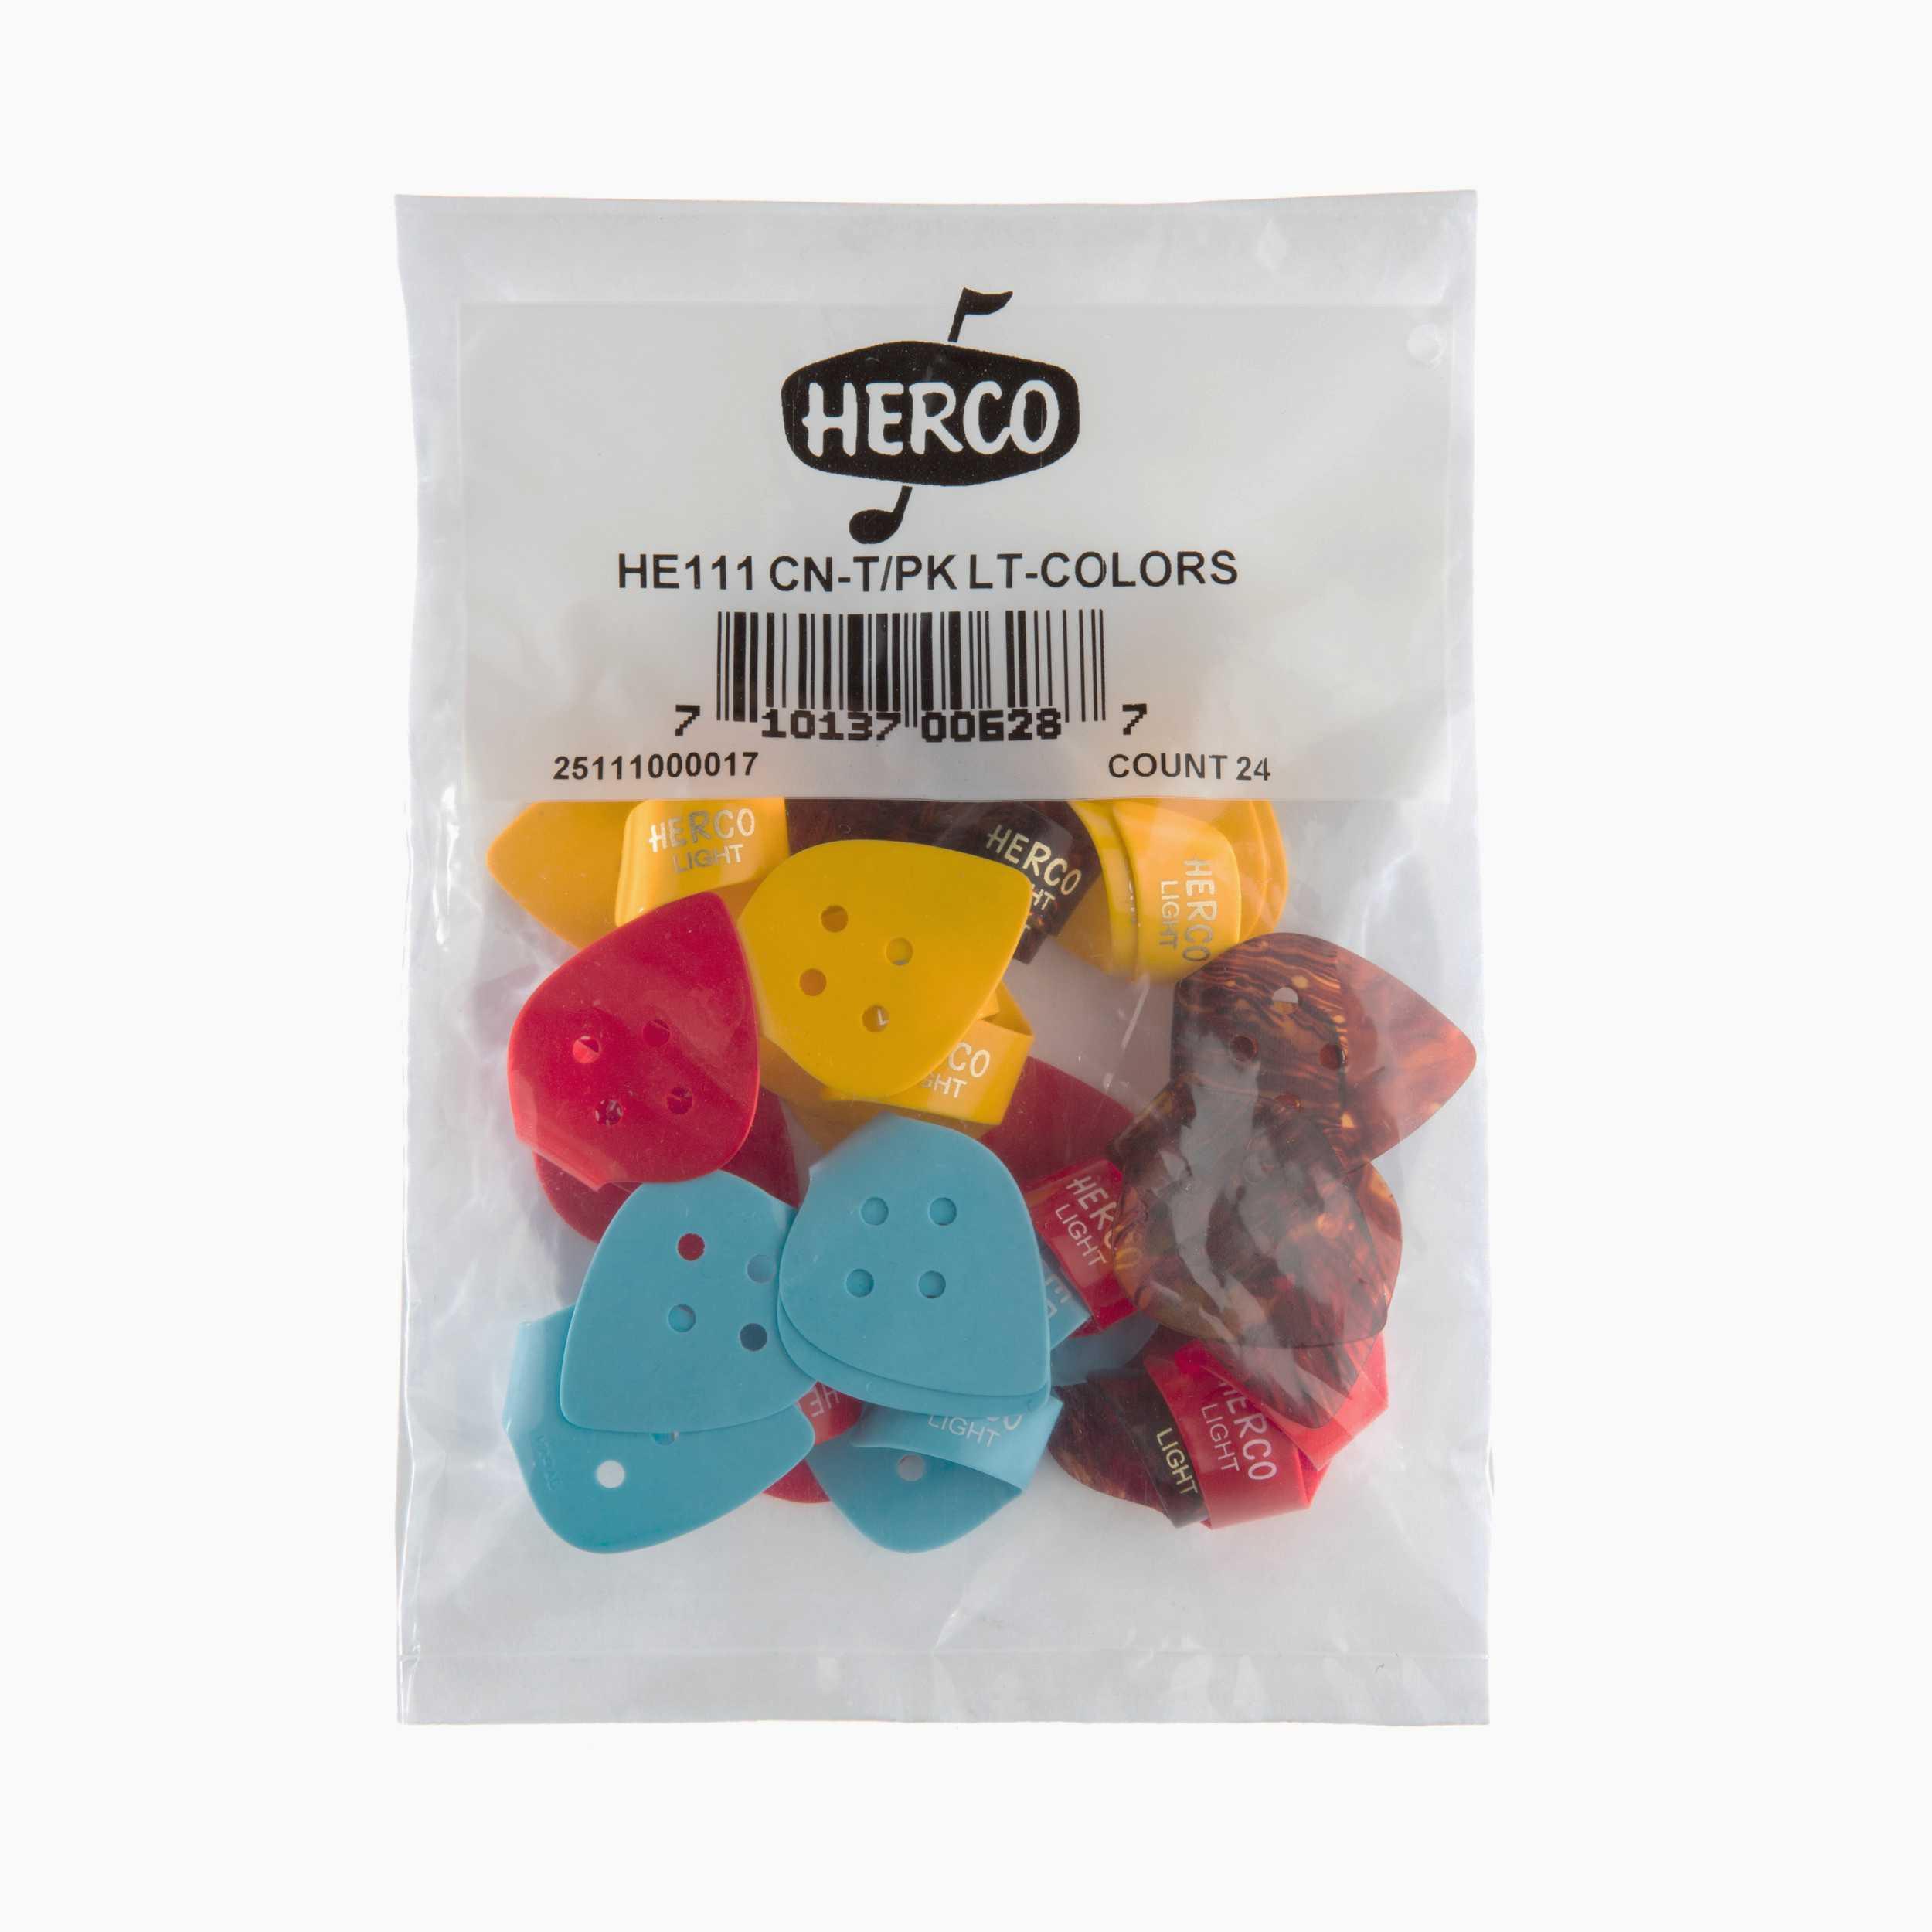 Herco Flat Thumbpick, light